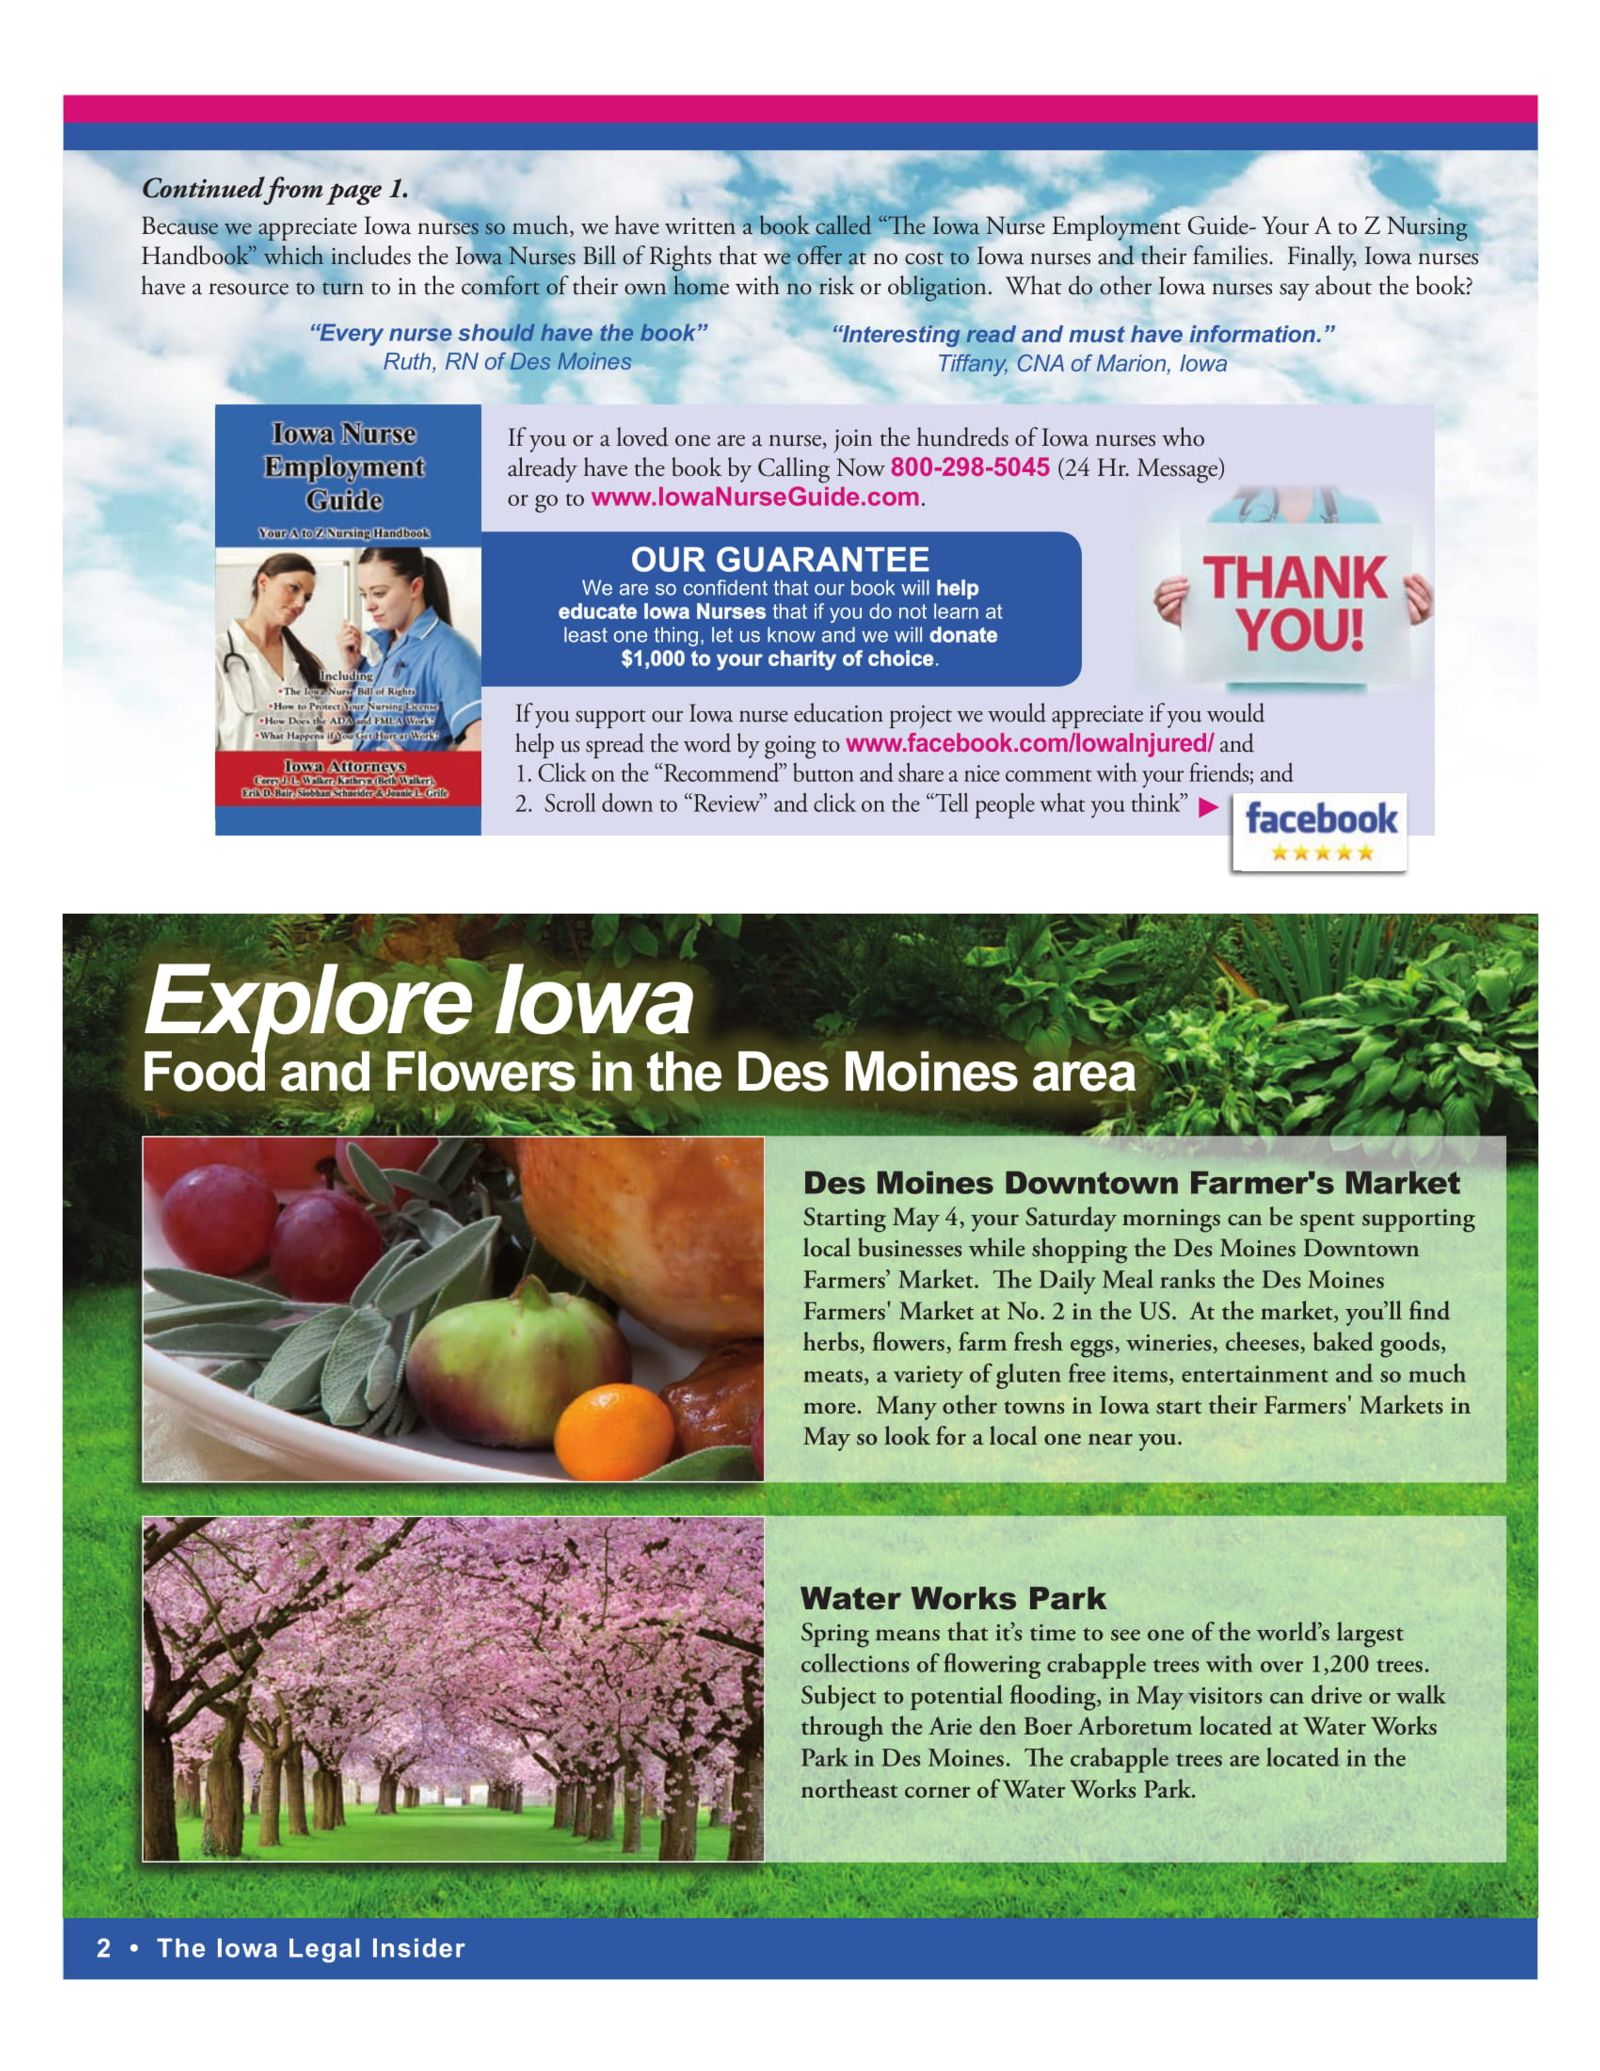 The Iowa Legal Insider Explore Des Moines